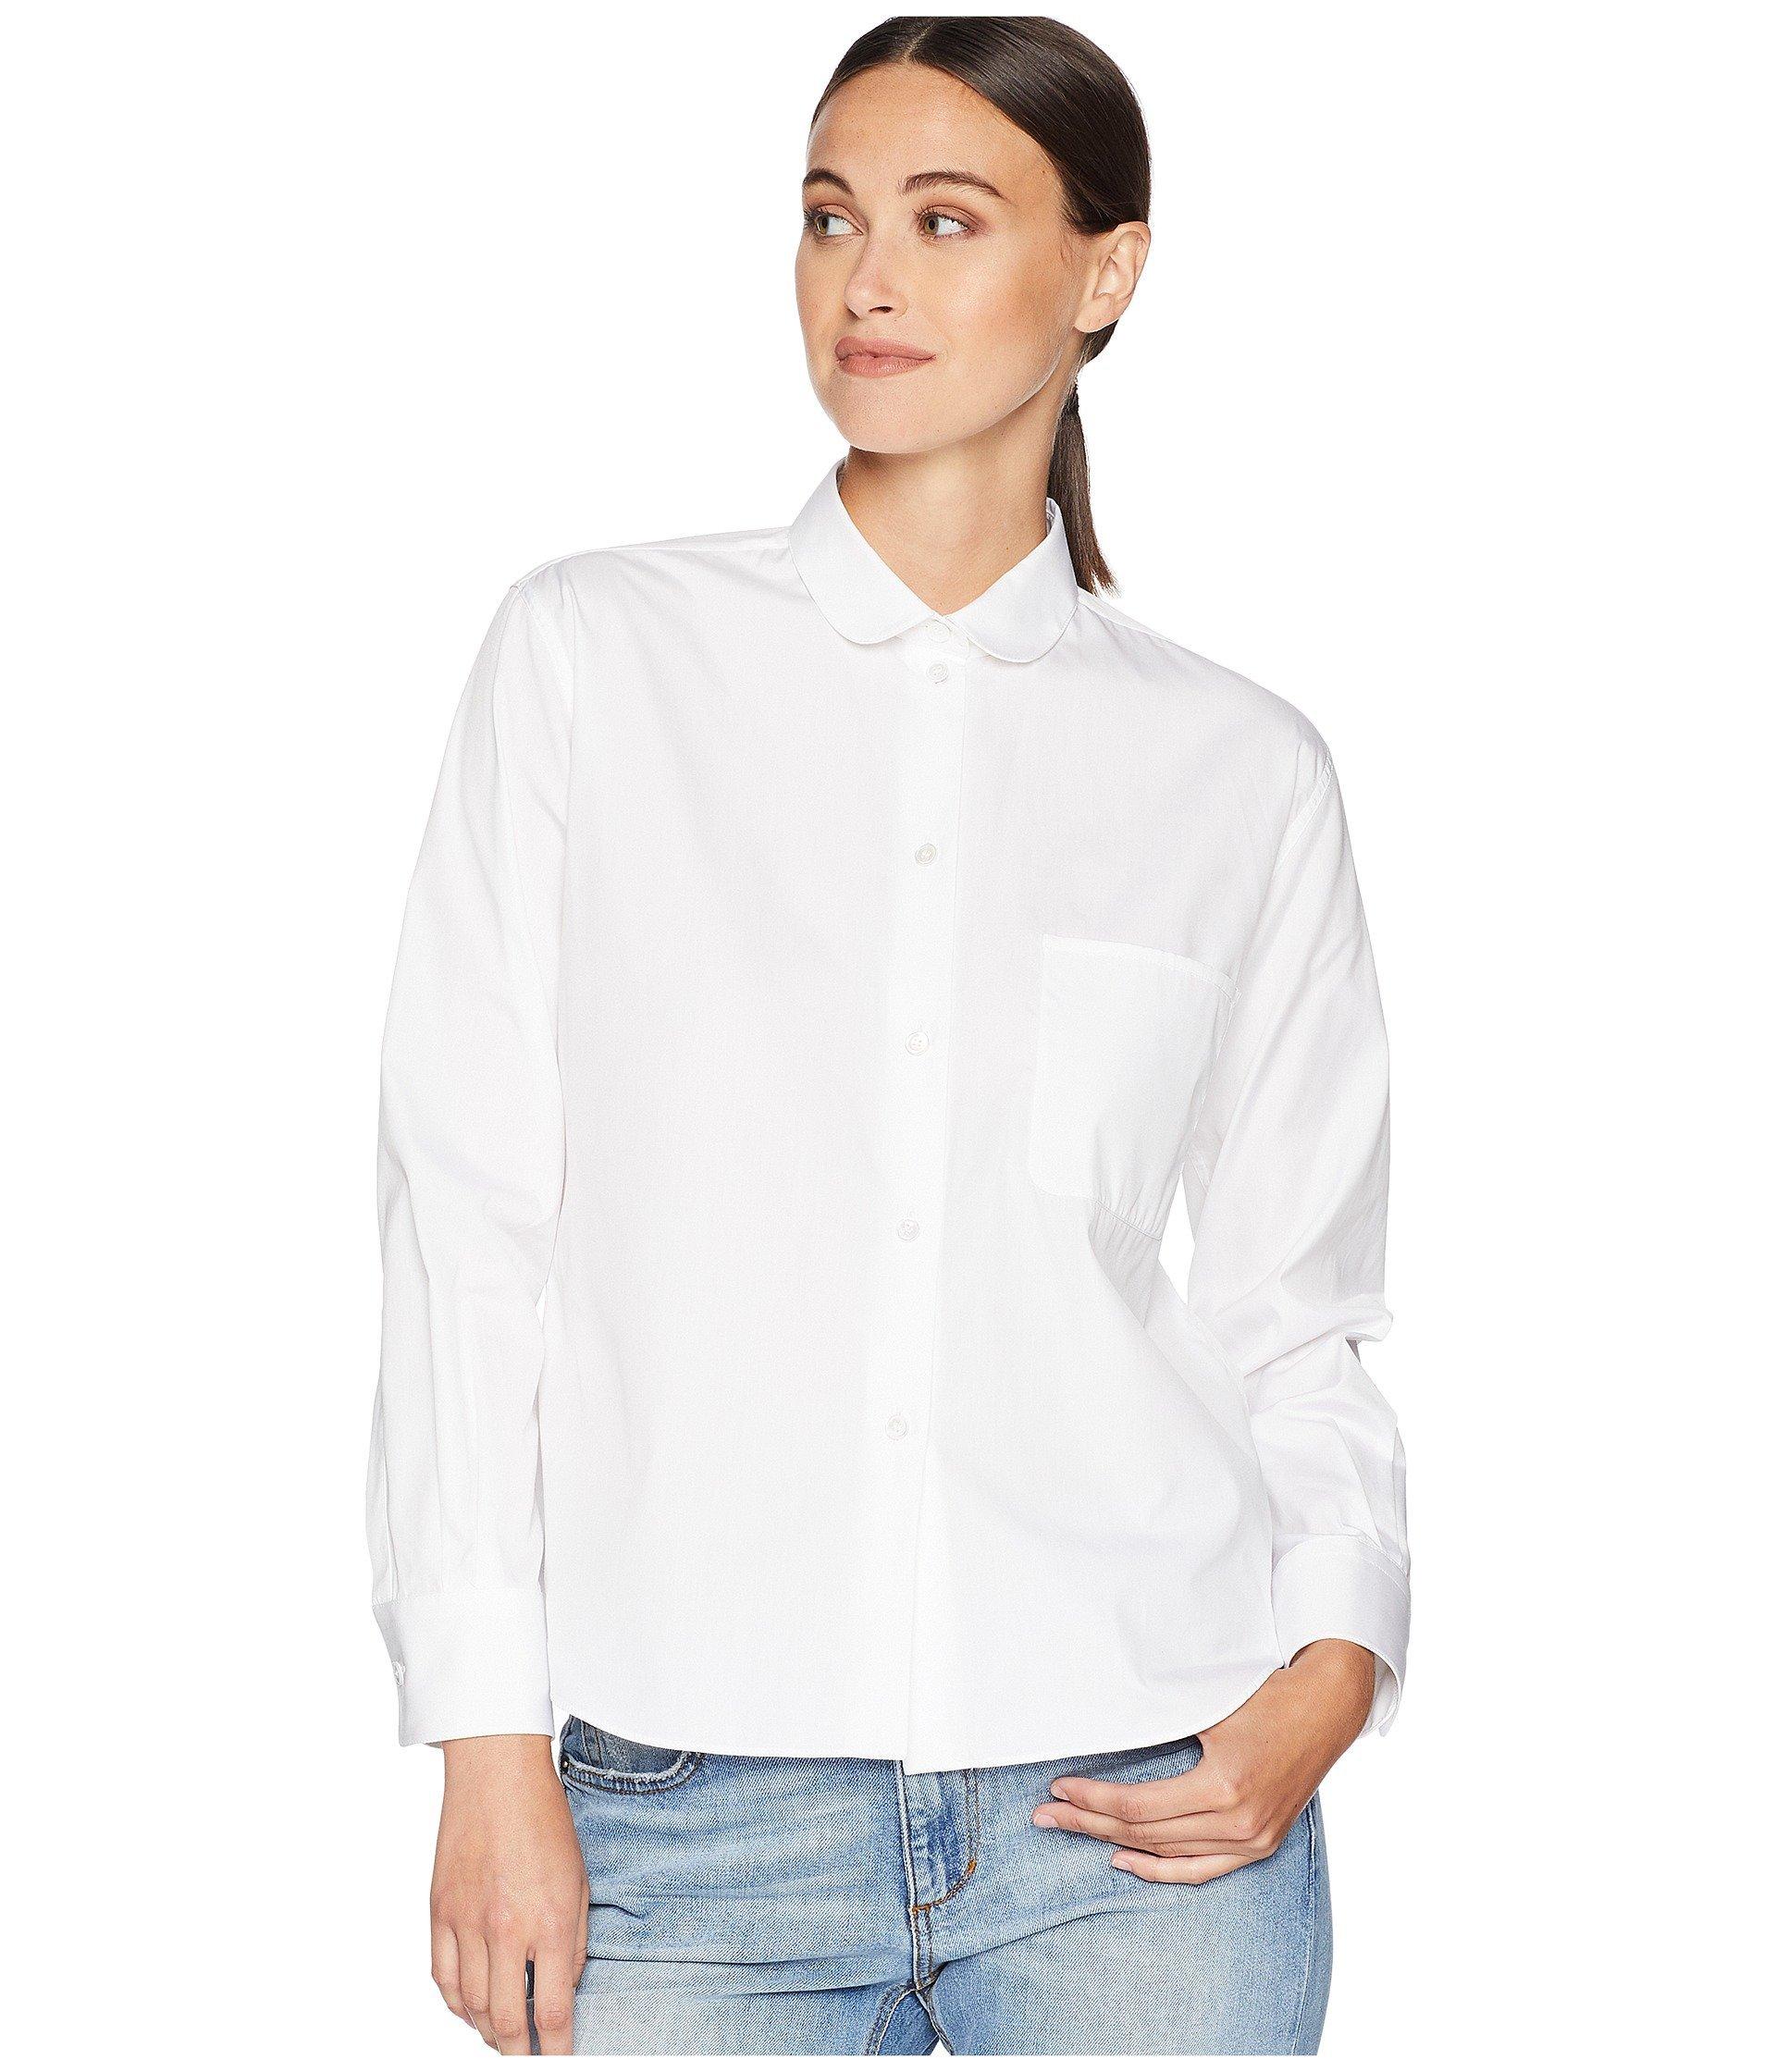 The Sleeve Long Shirt Front Sander Round White Jil Collar Navy On Pocket qwHgCqxf